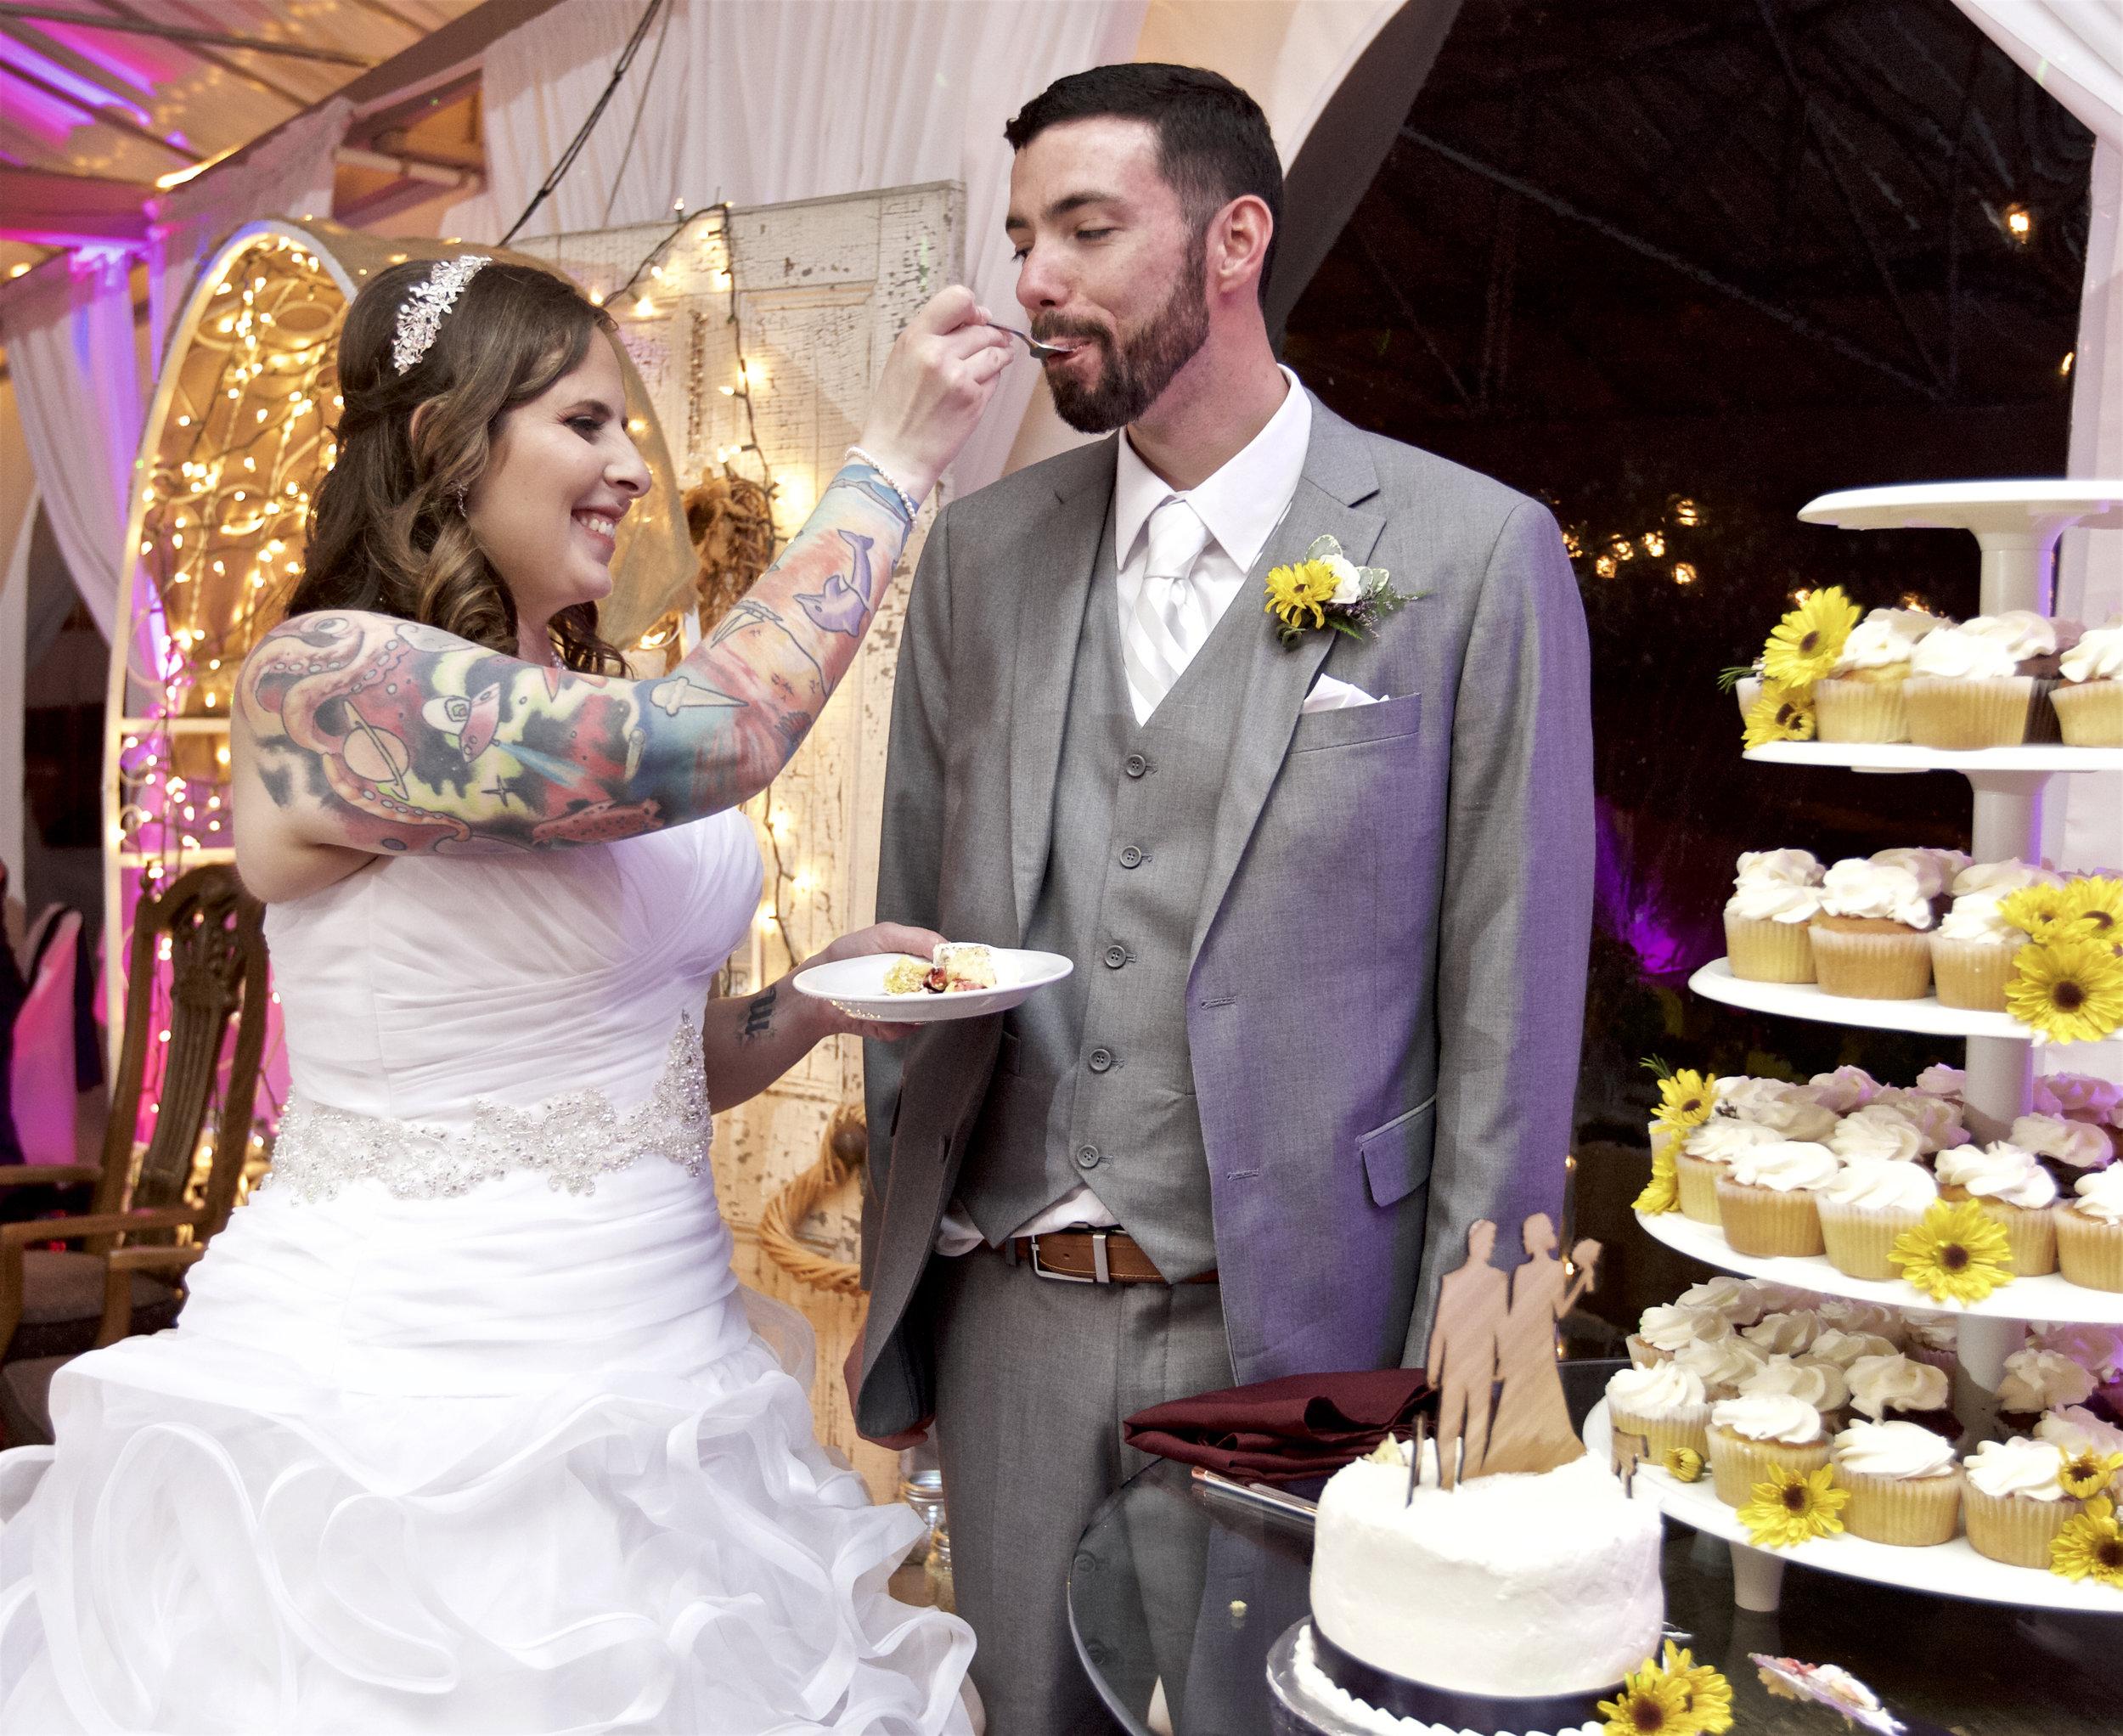 Lippincott manor wedding, wallkill ny wedding, photography, photos g.jpg